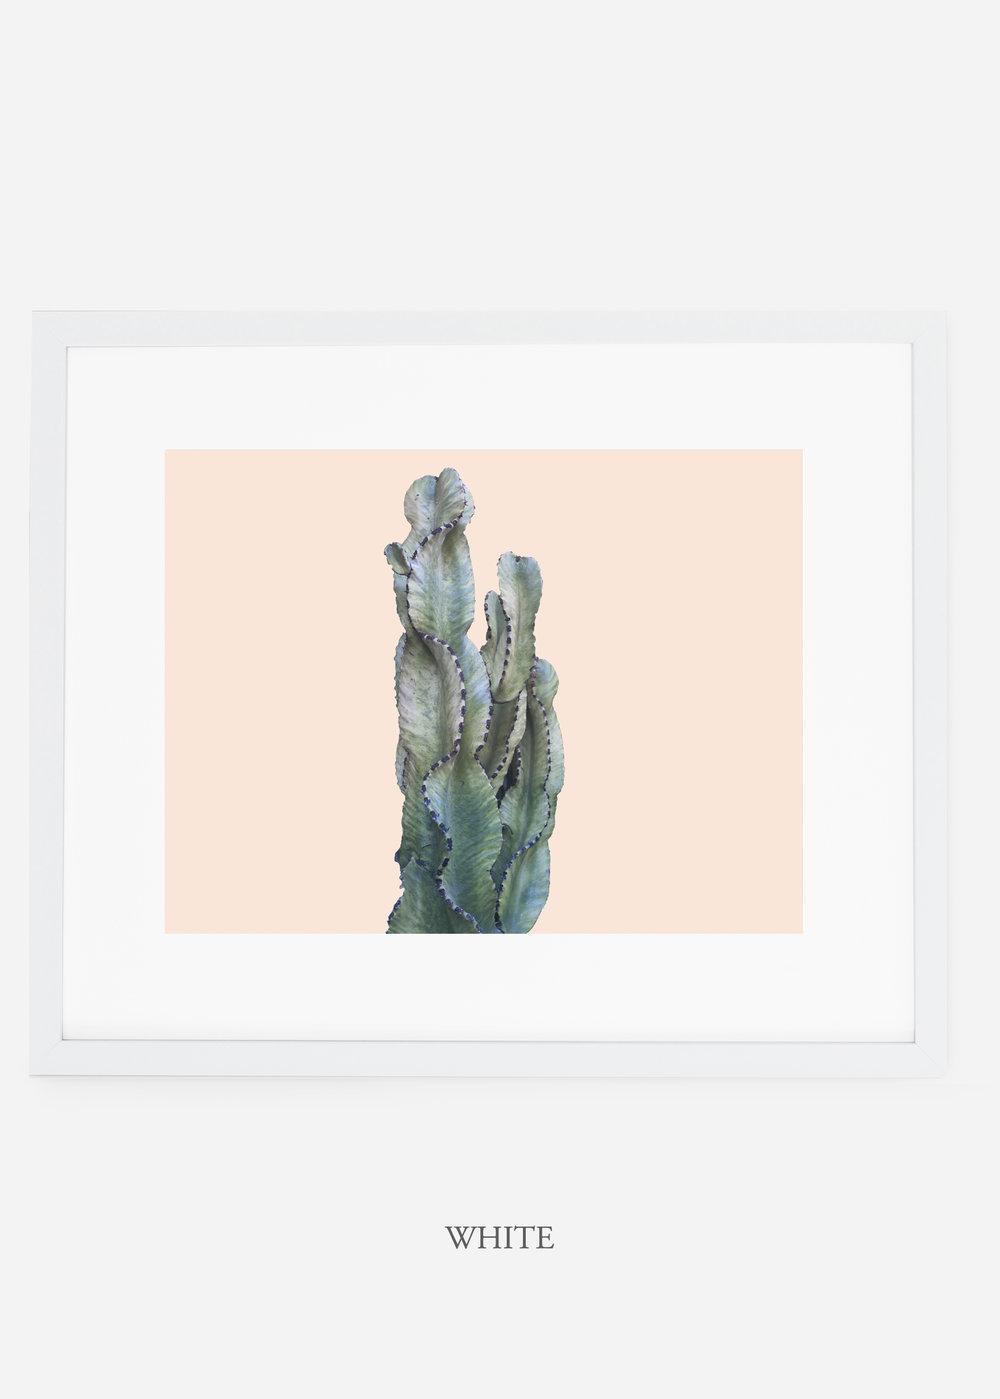 WilderCalifornia_whiteframe_top_gallery__Cactus_Art_Photography_interiordesign_white_bohemian_neutral_photography_photo.jpg